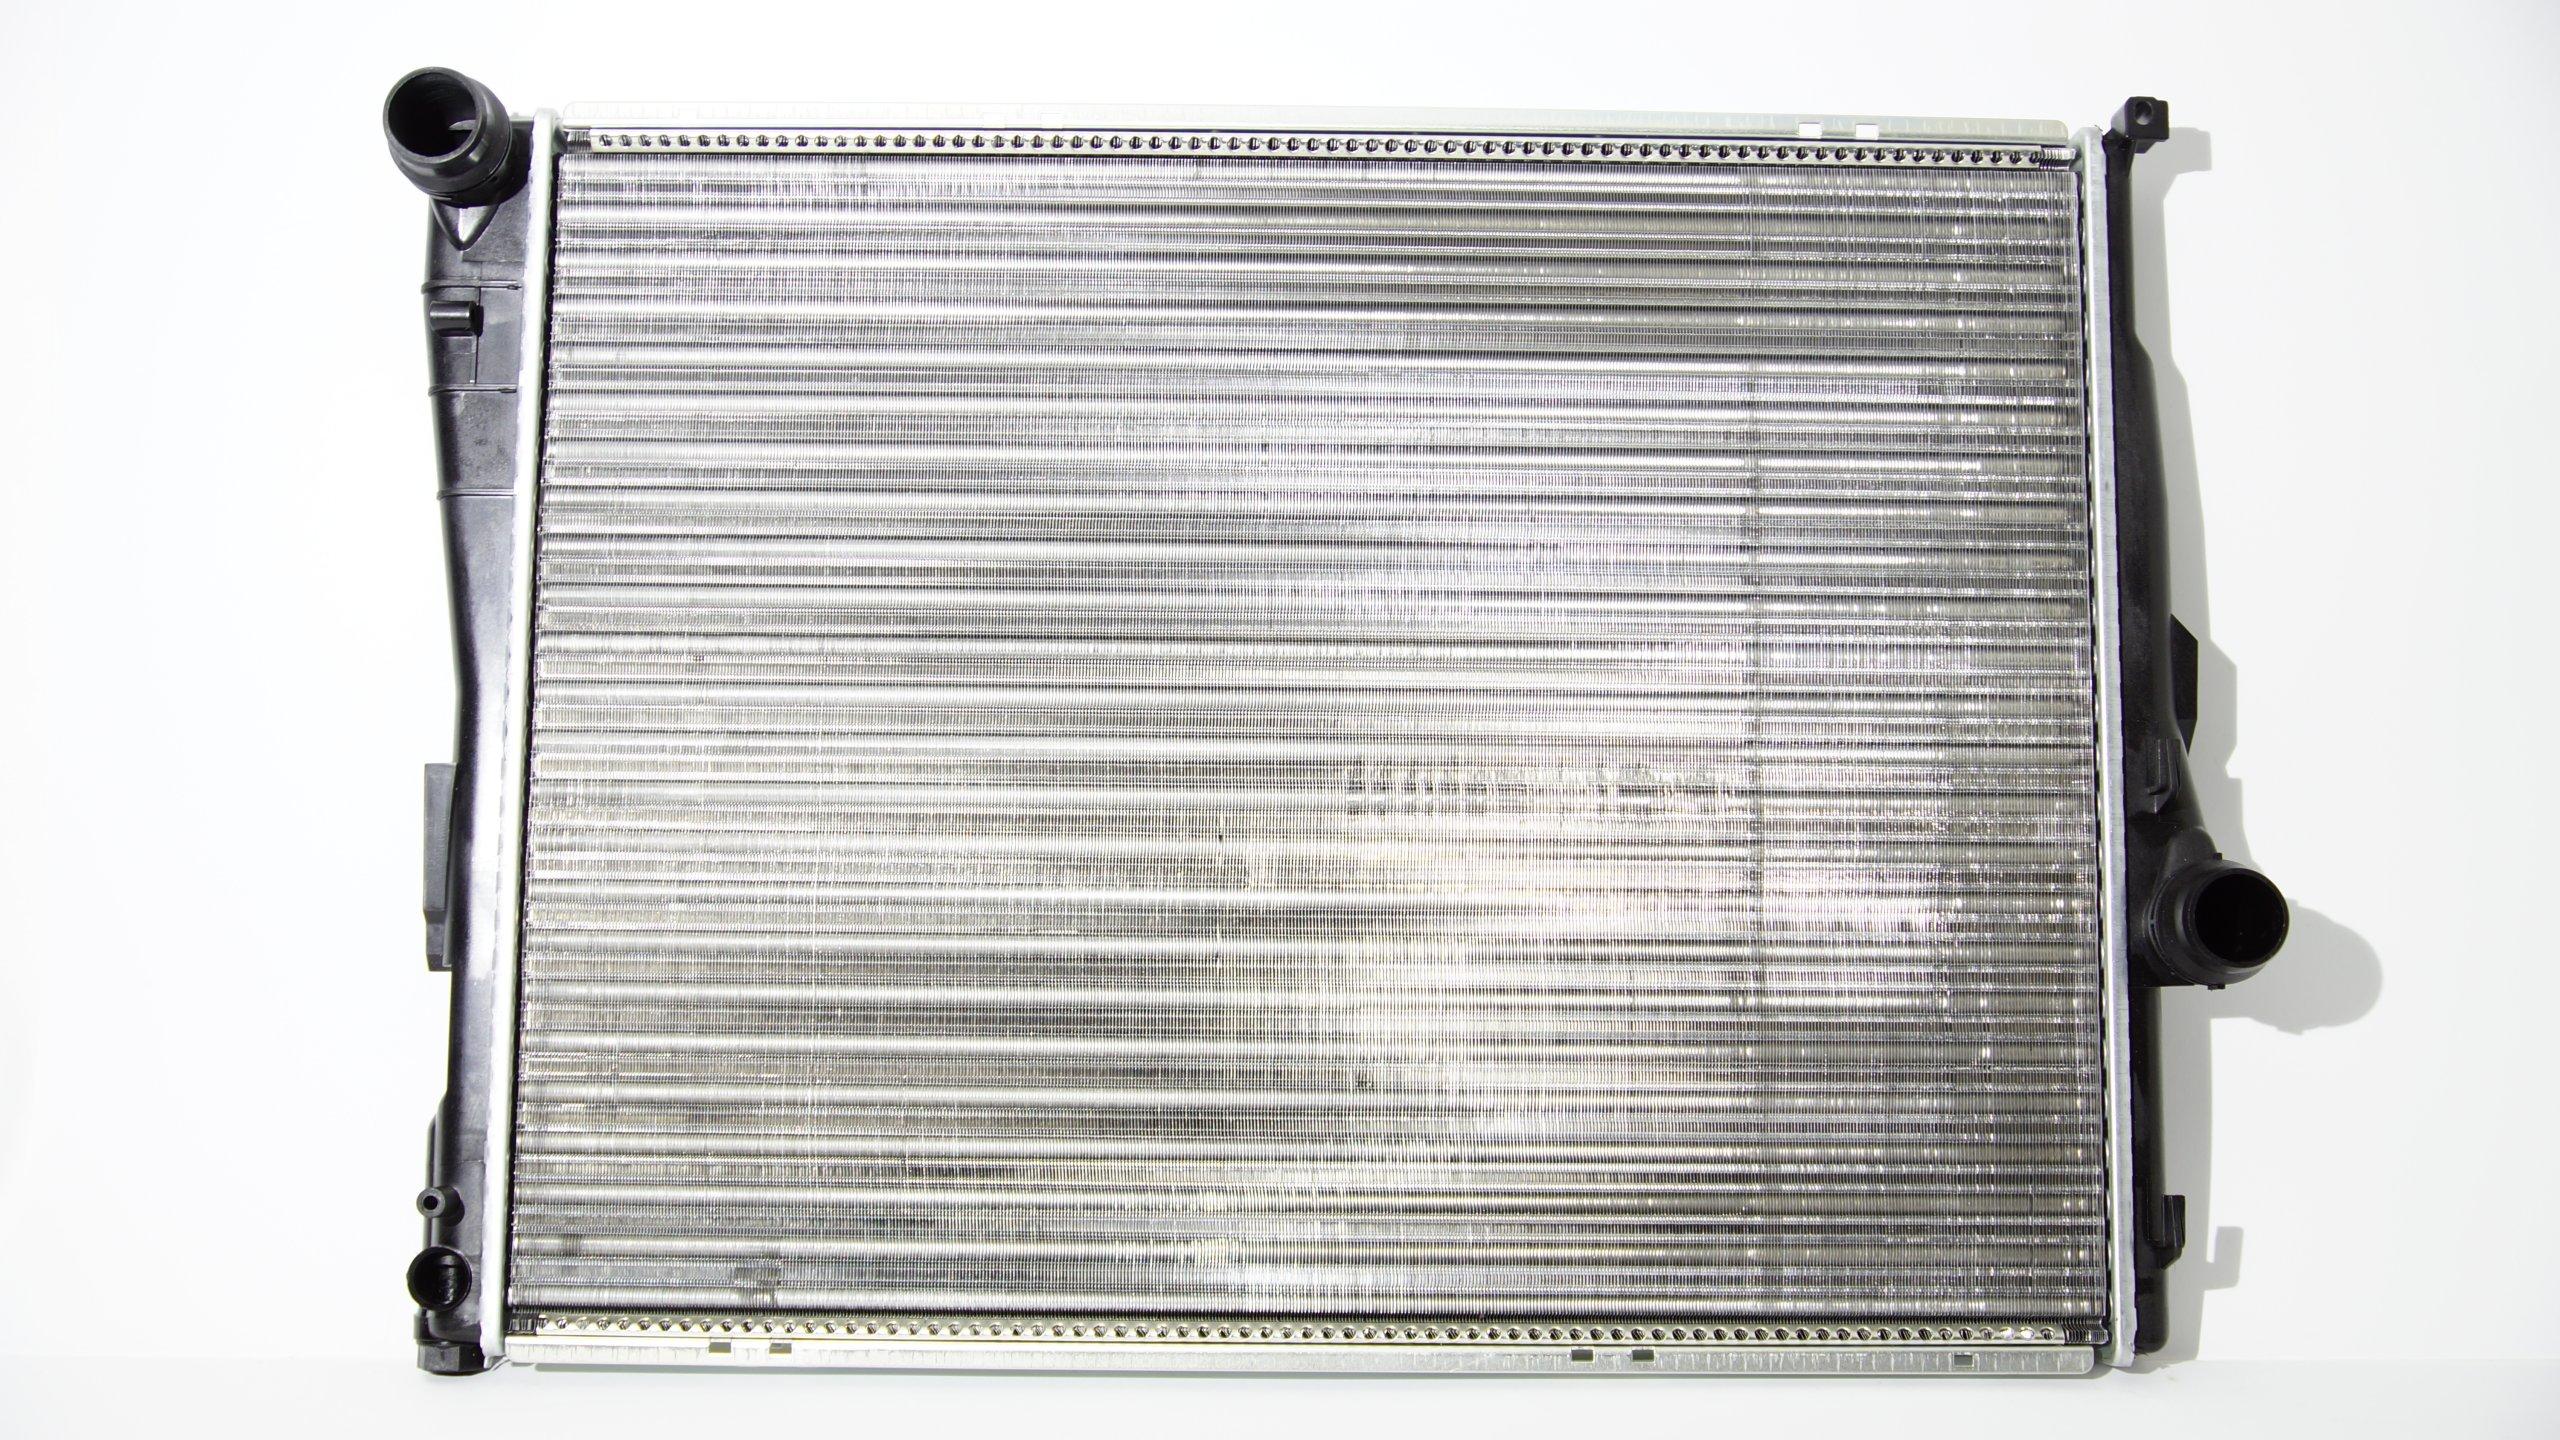 радиатор воды bmw 3 e46 316 318 320 323 328 330